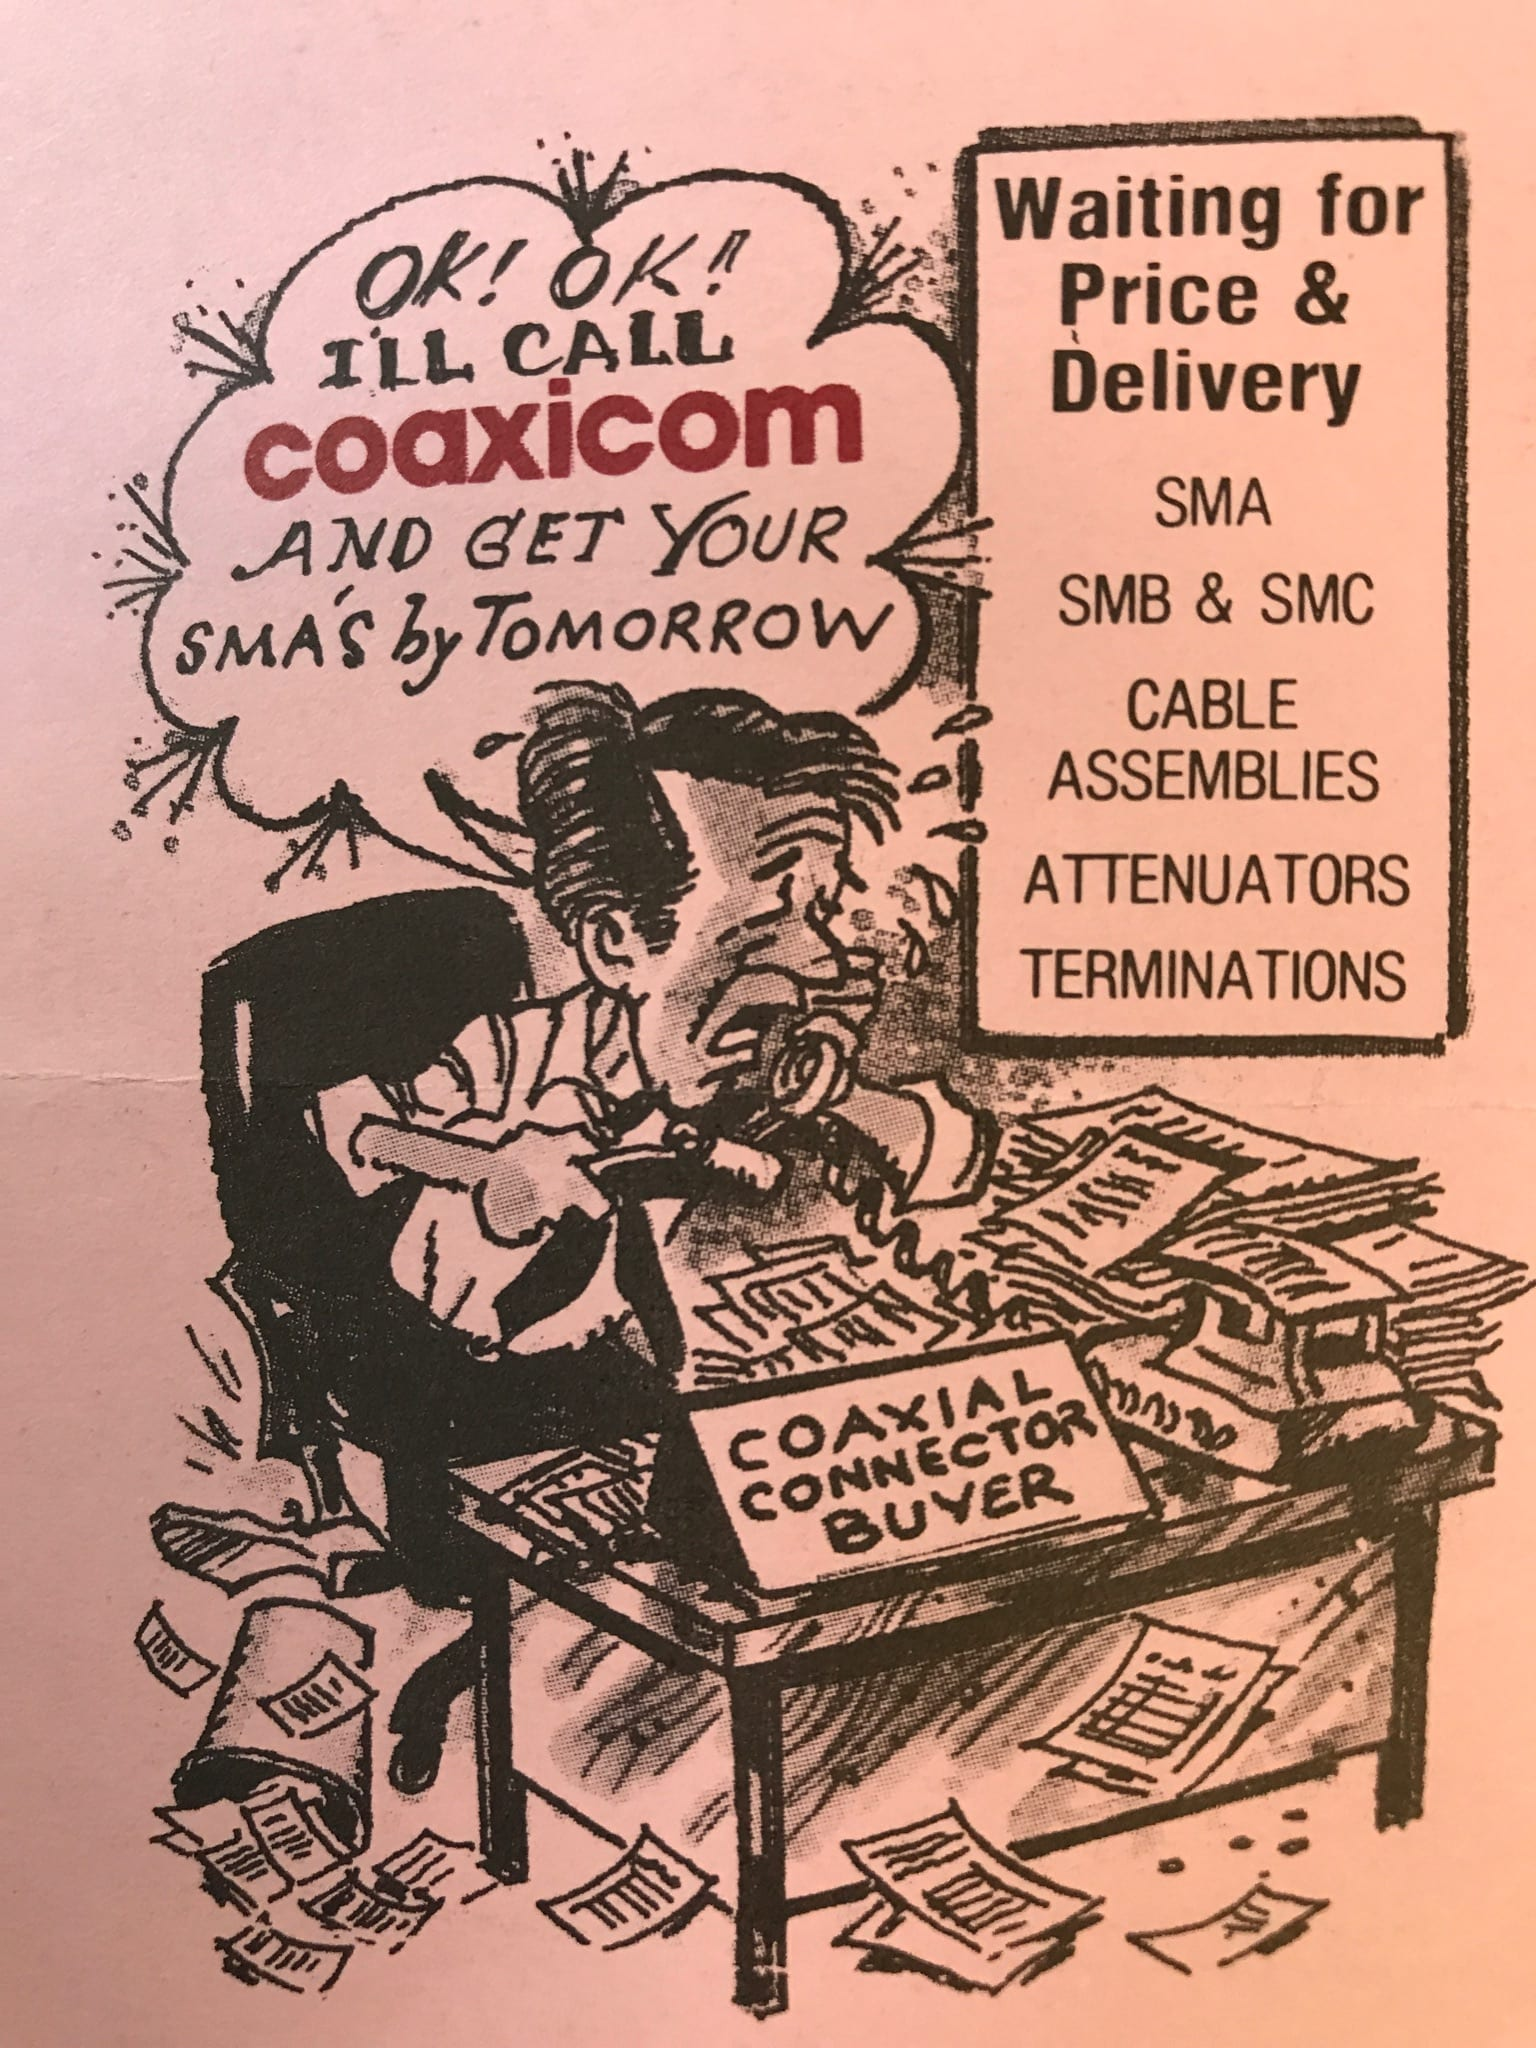 Coaxicom Advertising Creative for SMA Connectors